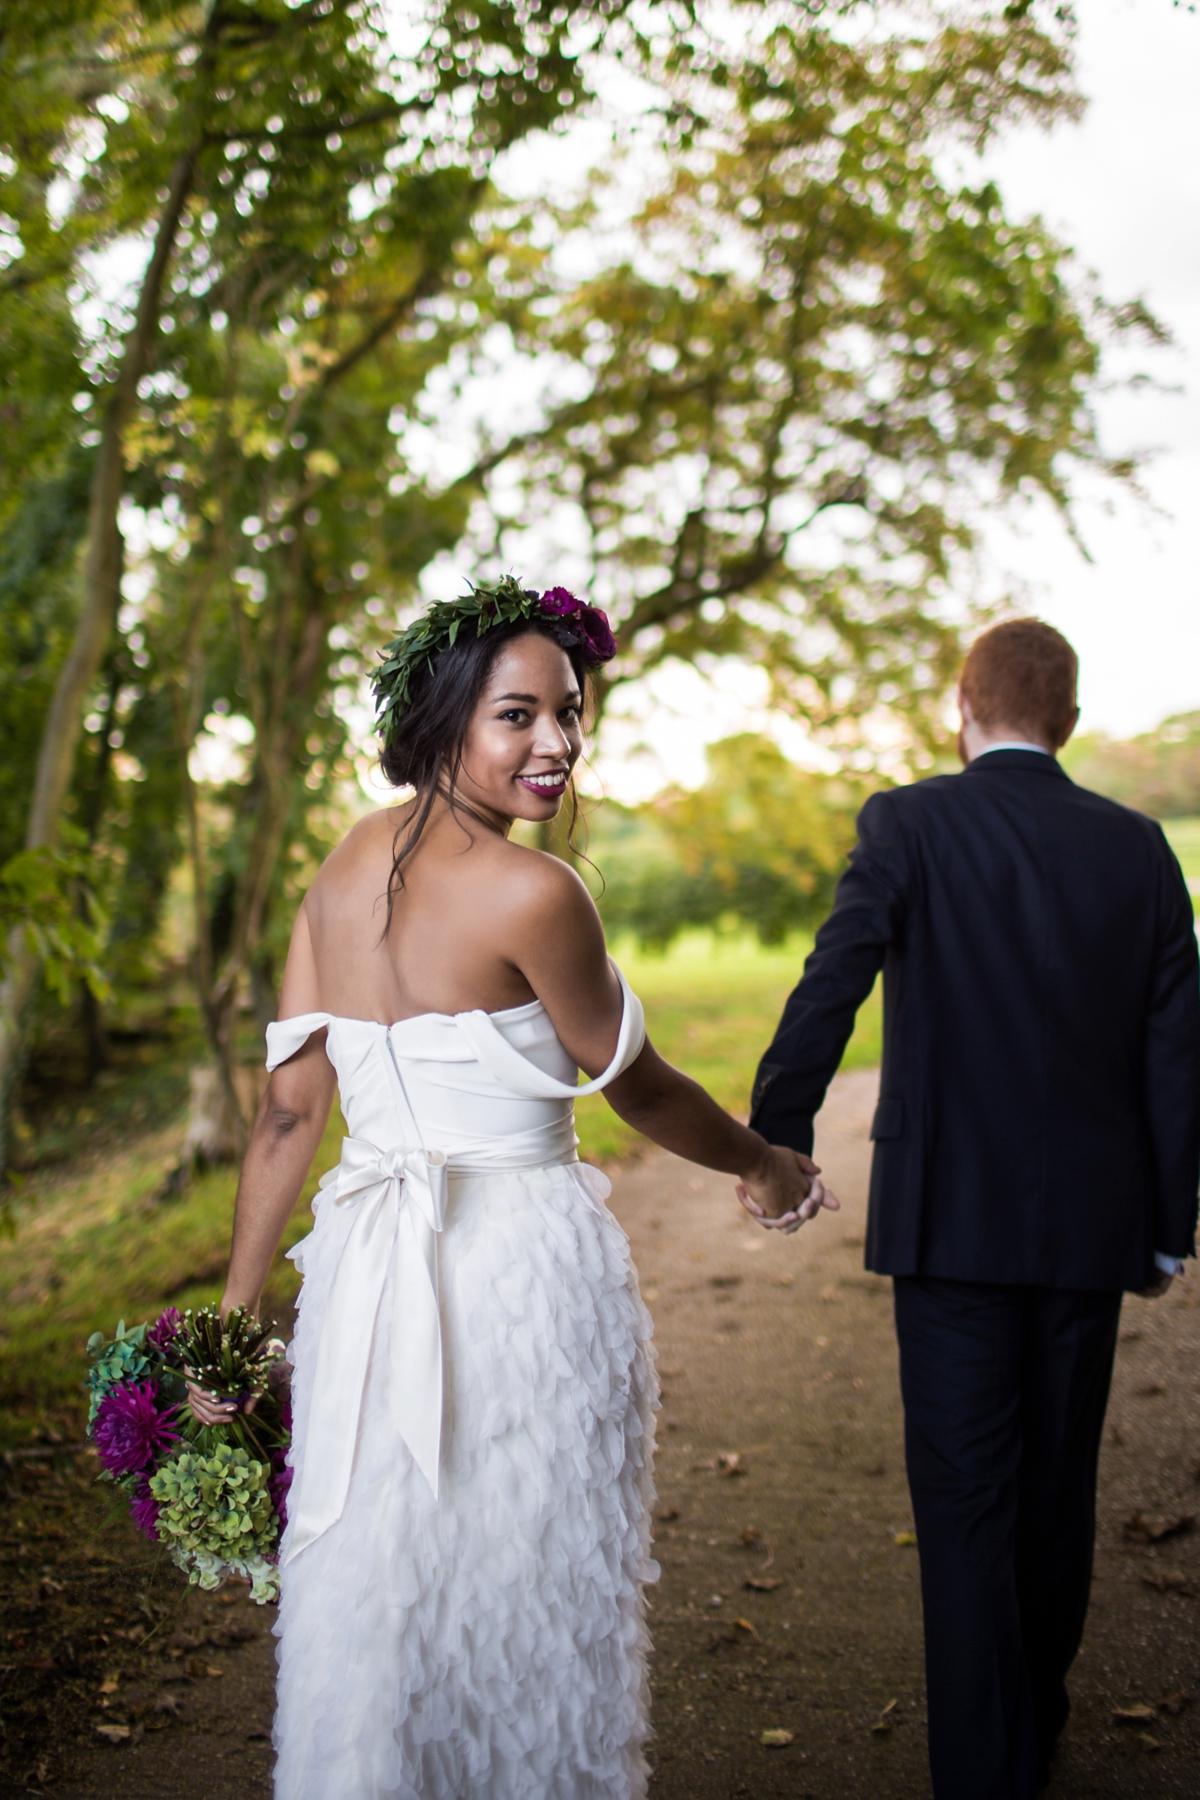 Beautiful bride Leah wore a wedding dress by Halfpenny London